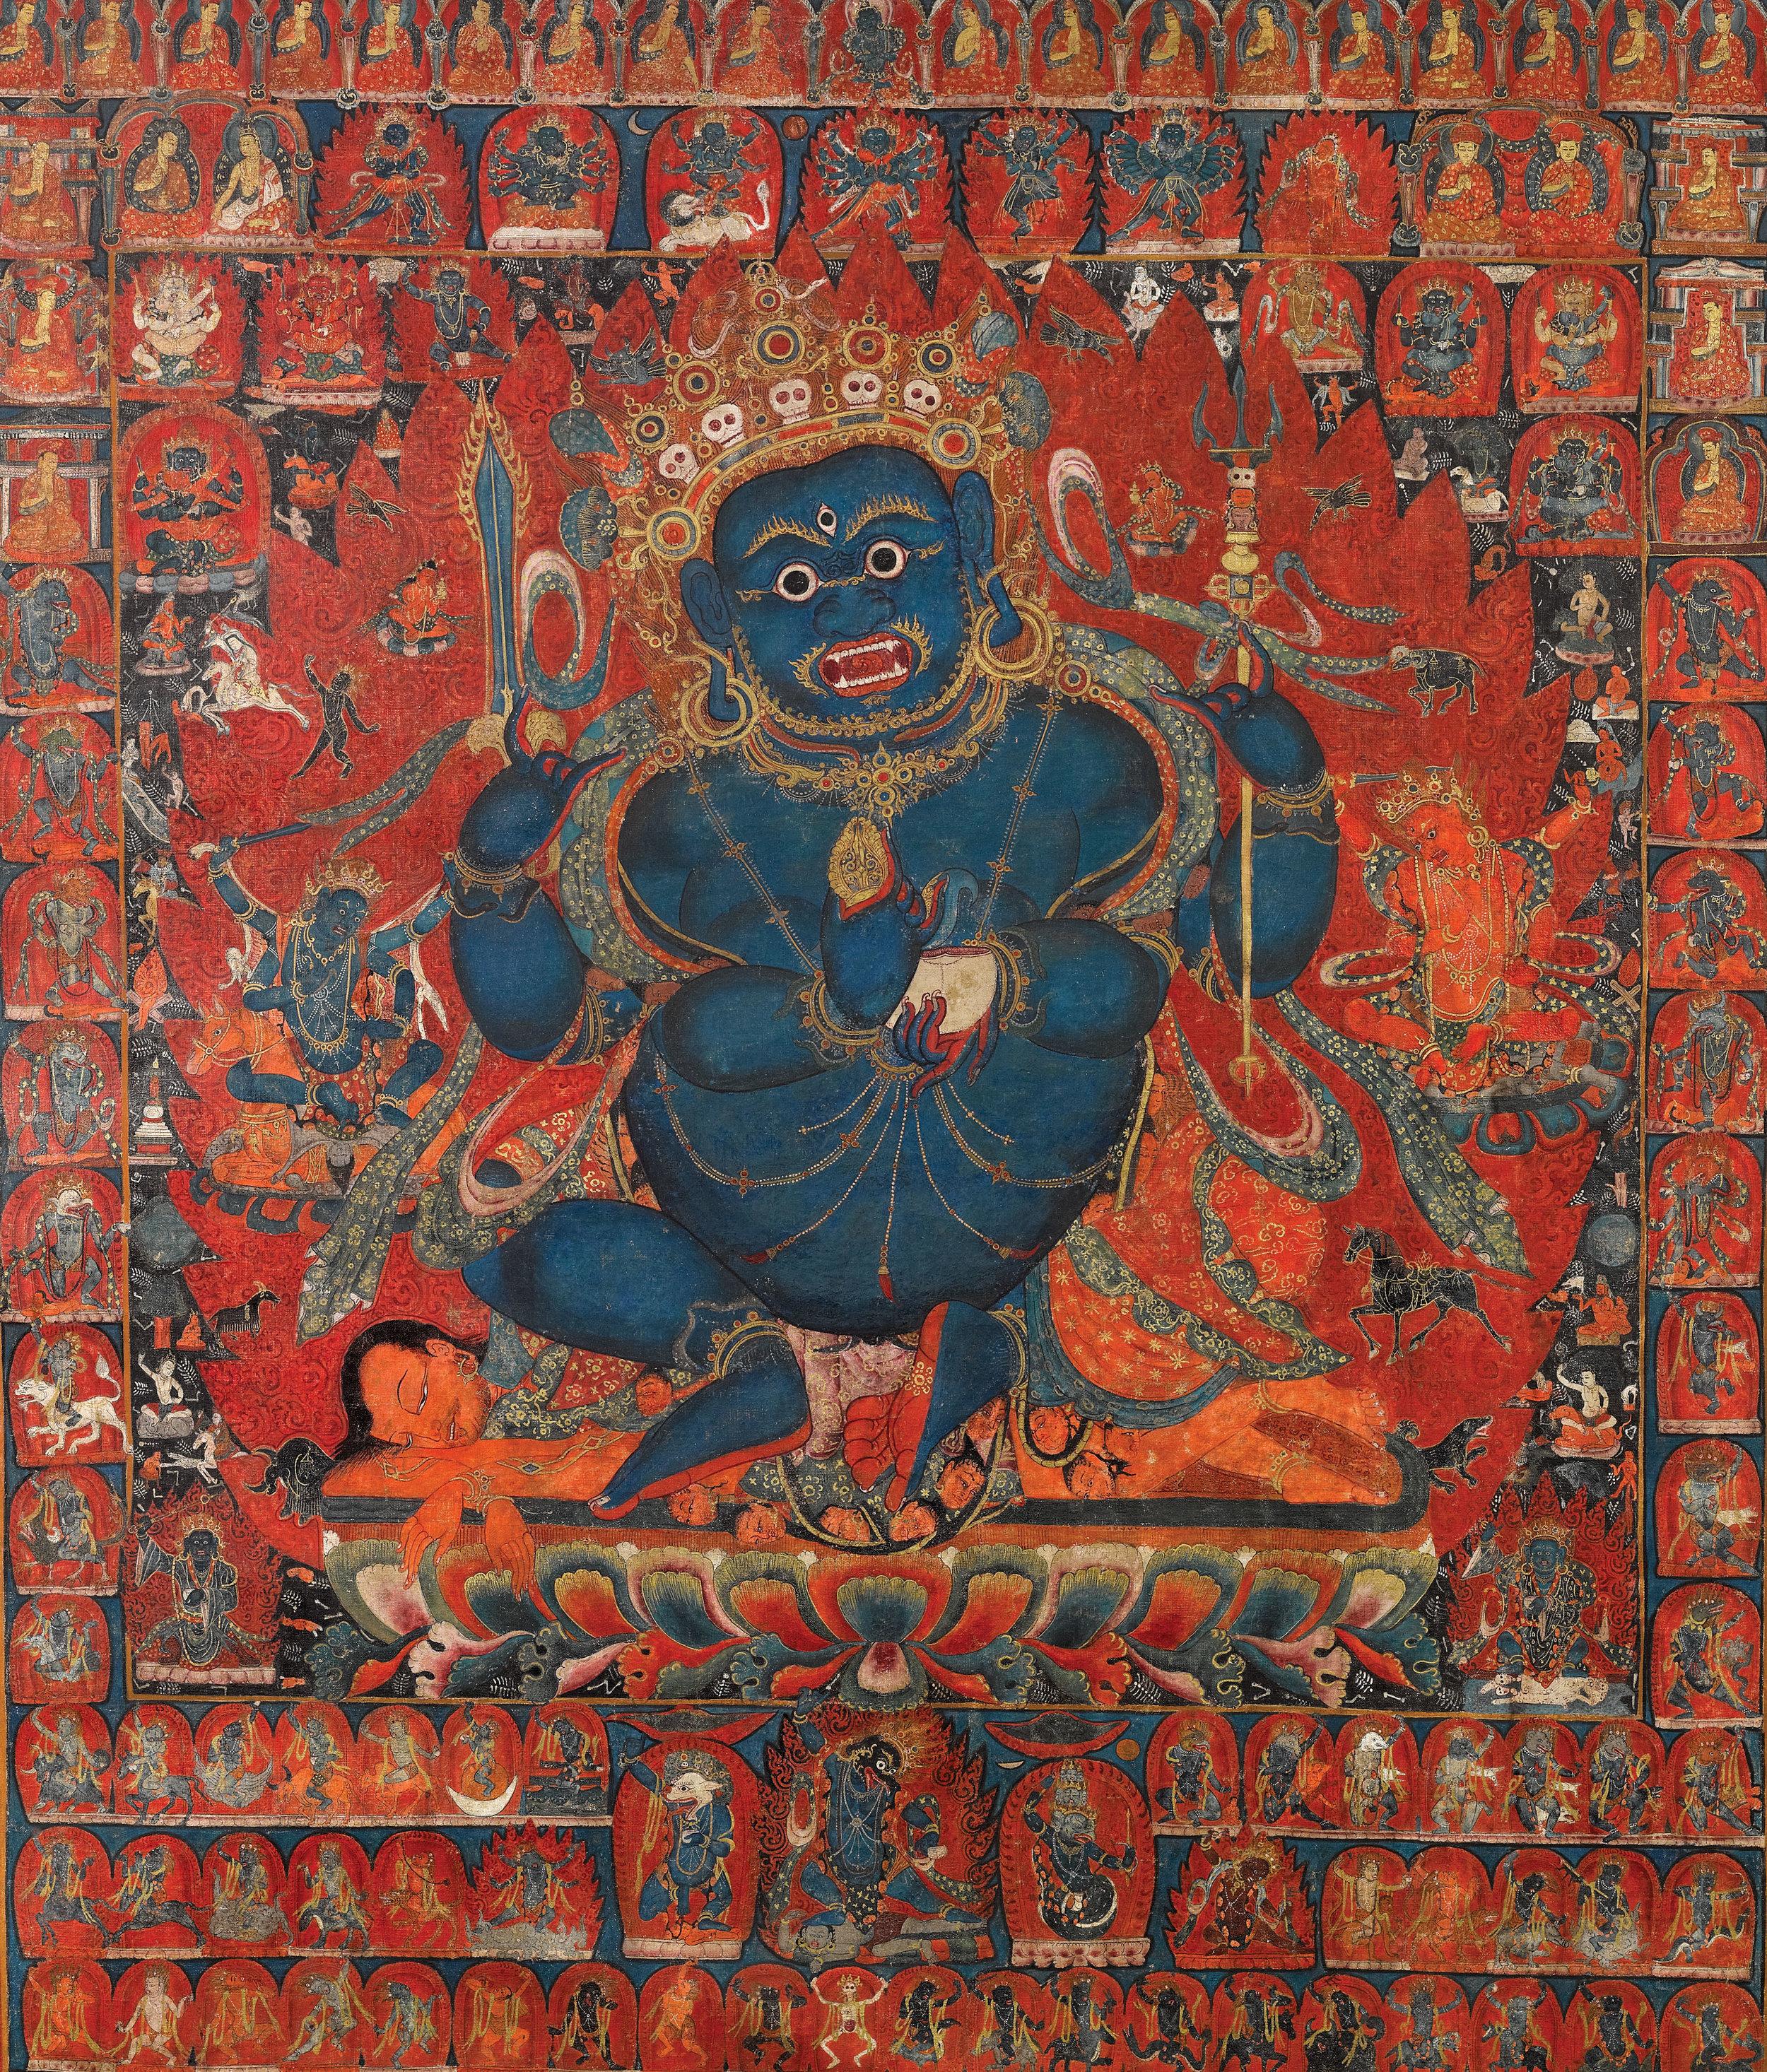 Seated Four-Arm Mahakala (detail), West Tibet, 14-15th Century, distemper on cloth